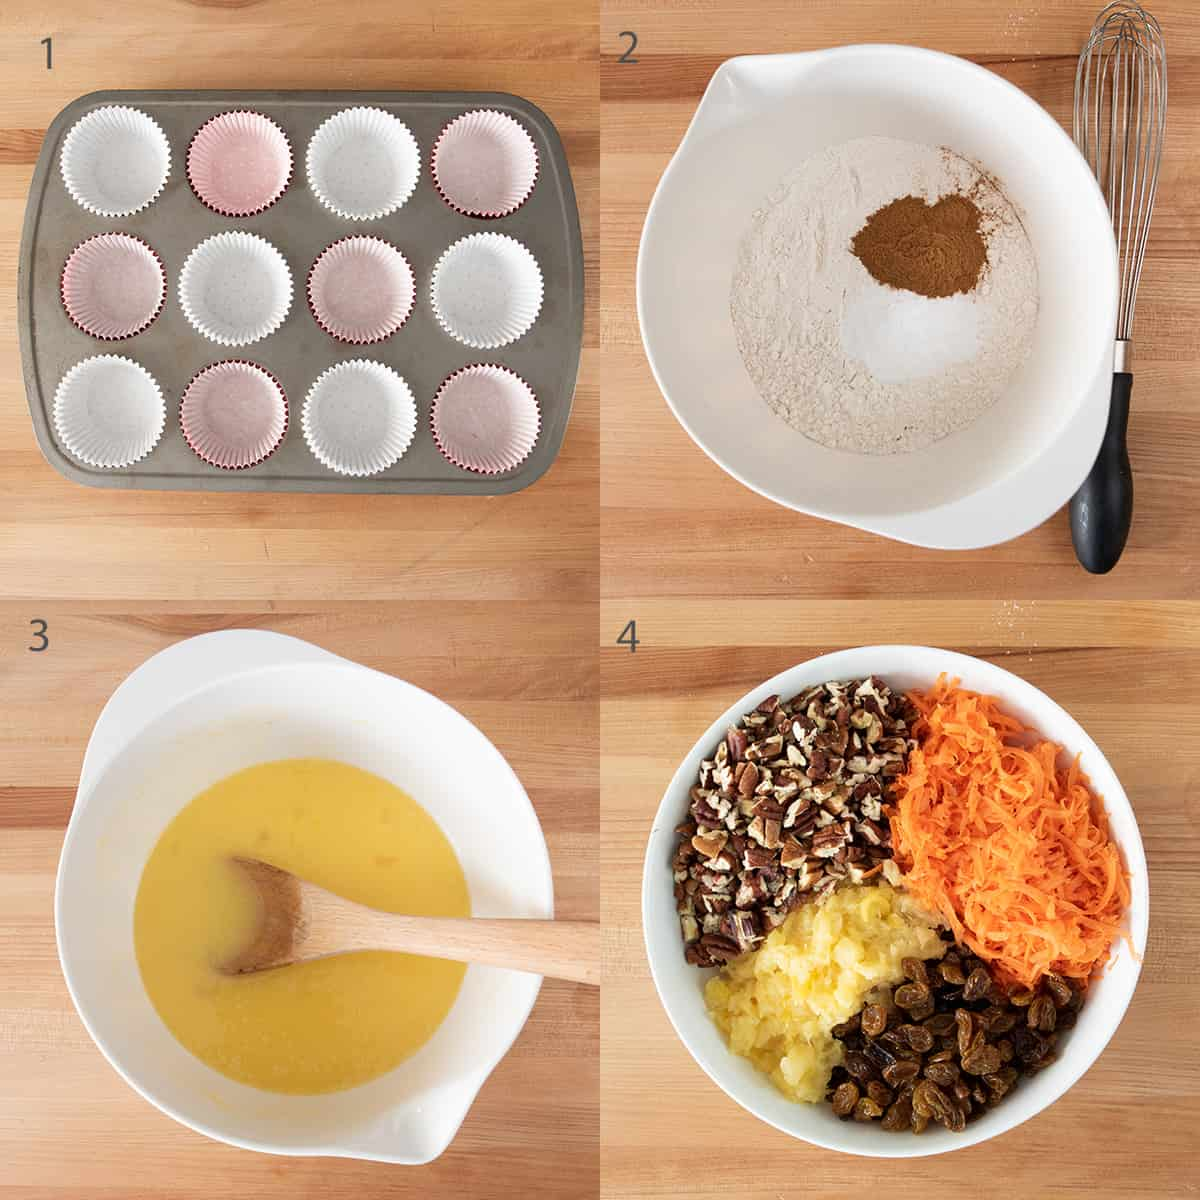 Steps 1-4 to make carrot cake cupcakes.